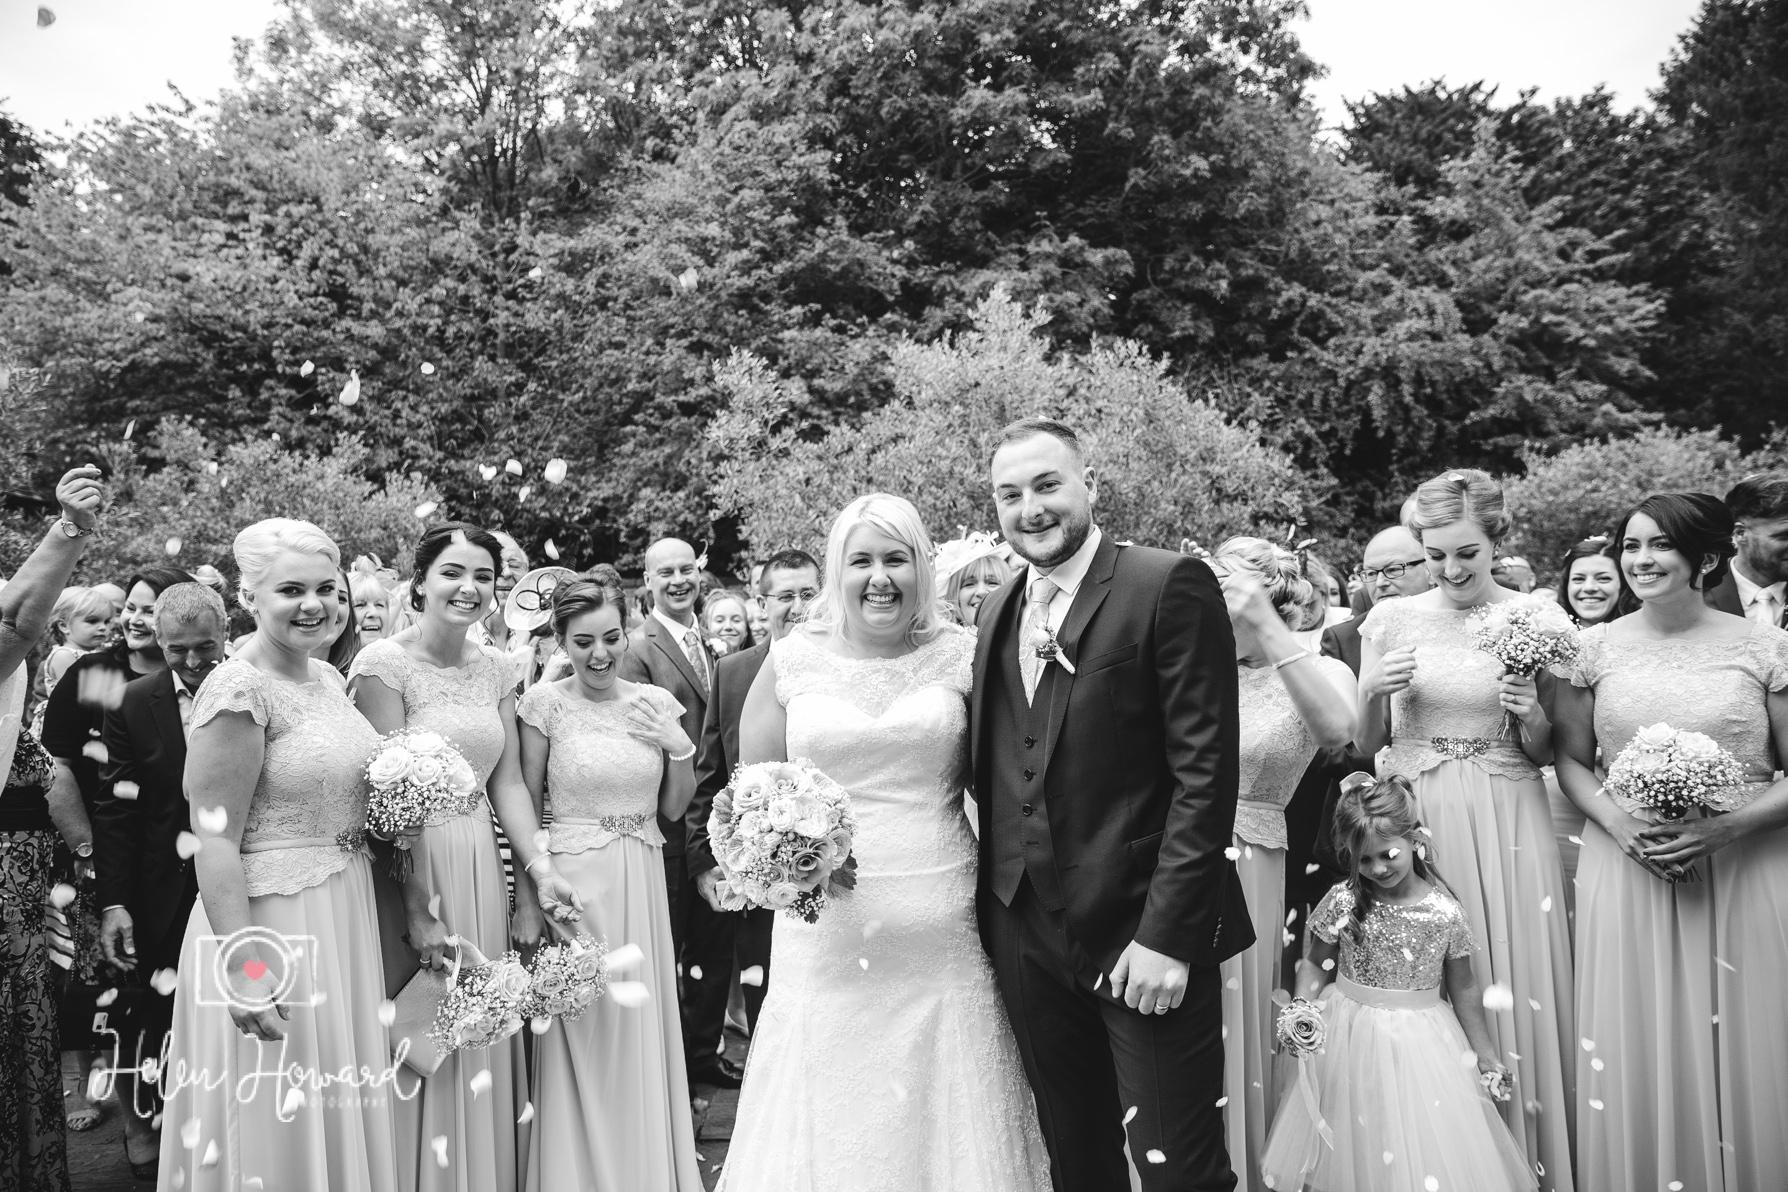 Shustoke Farm Barns Wedding Photography by Helen Howard-24.jpg